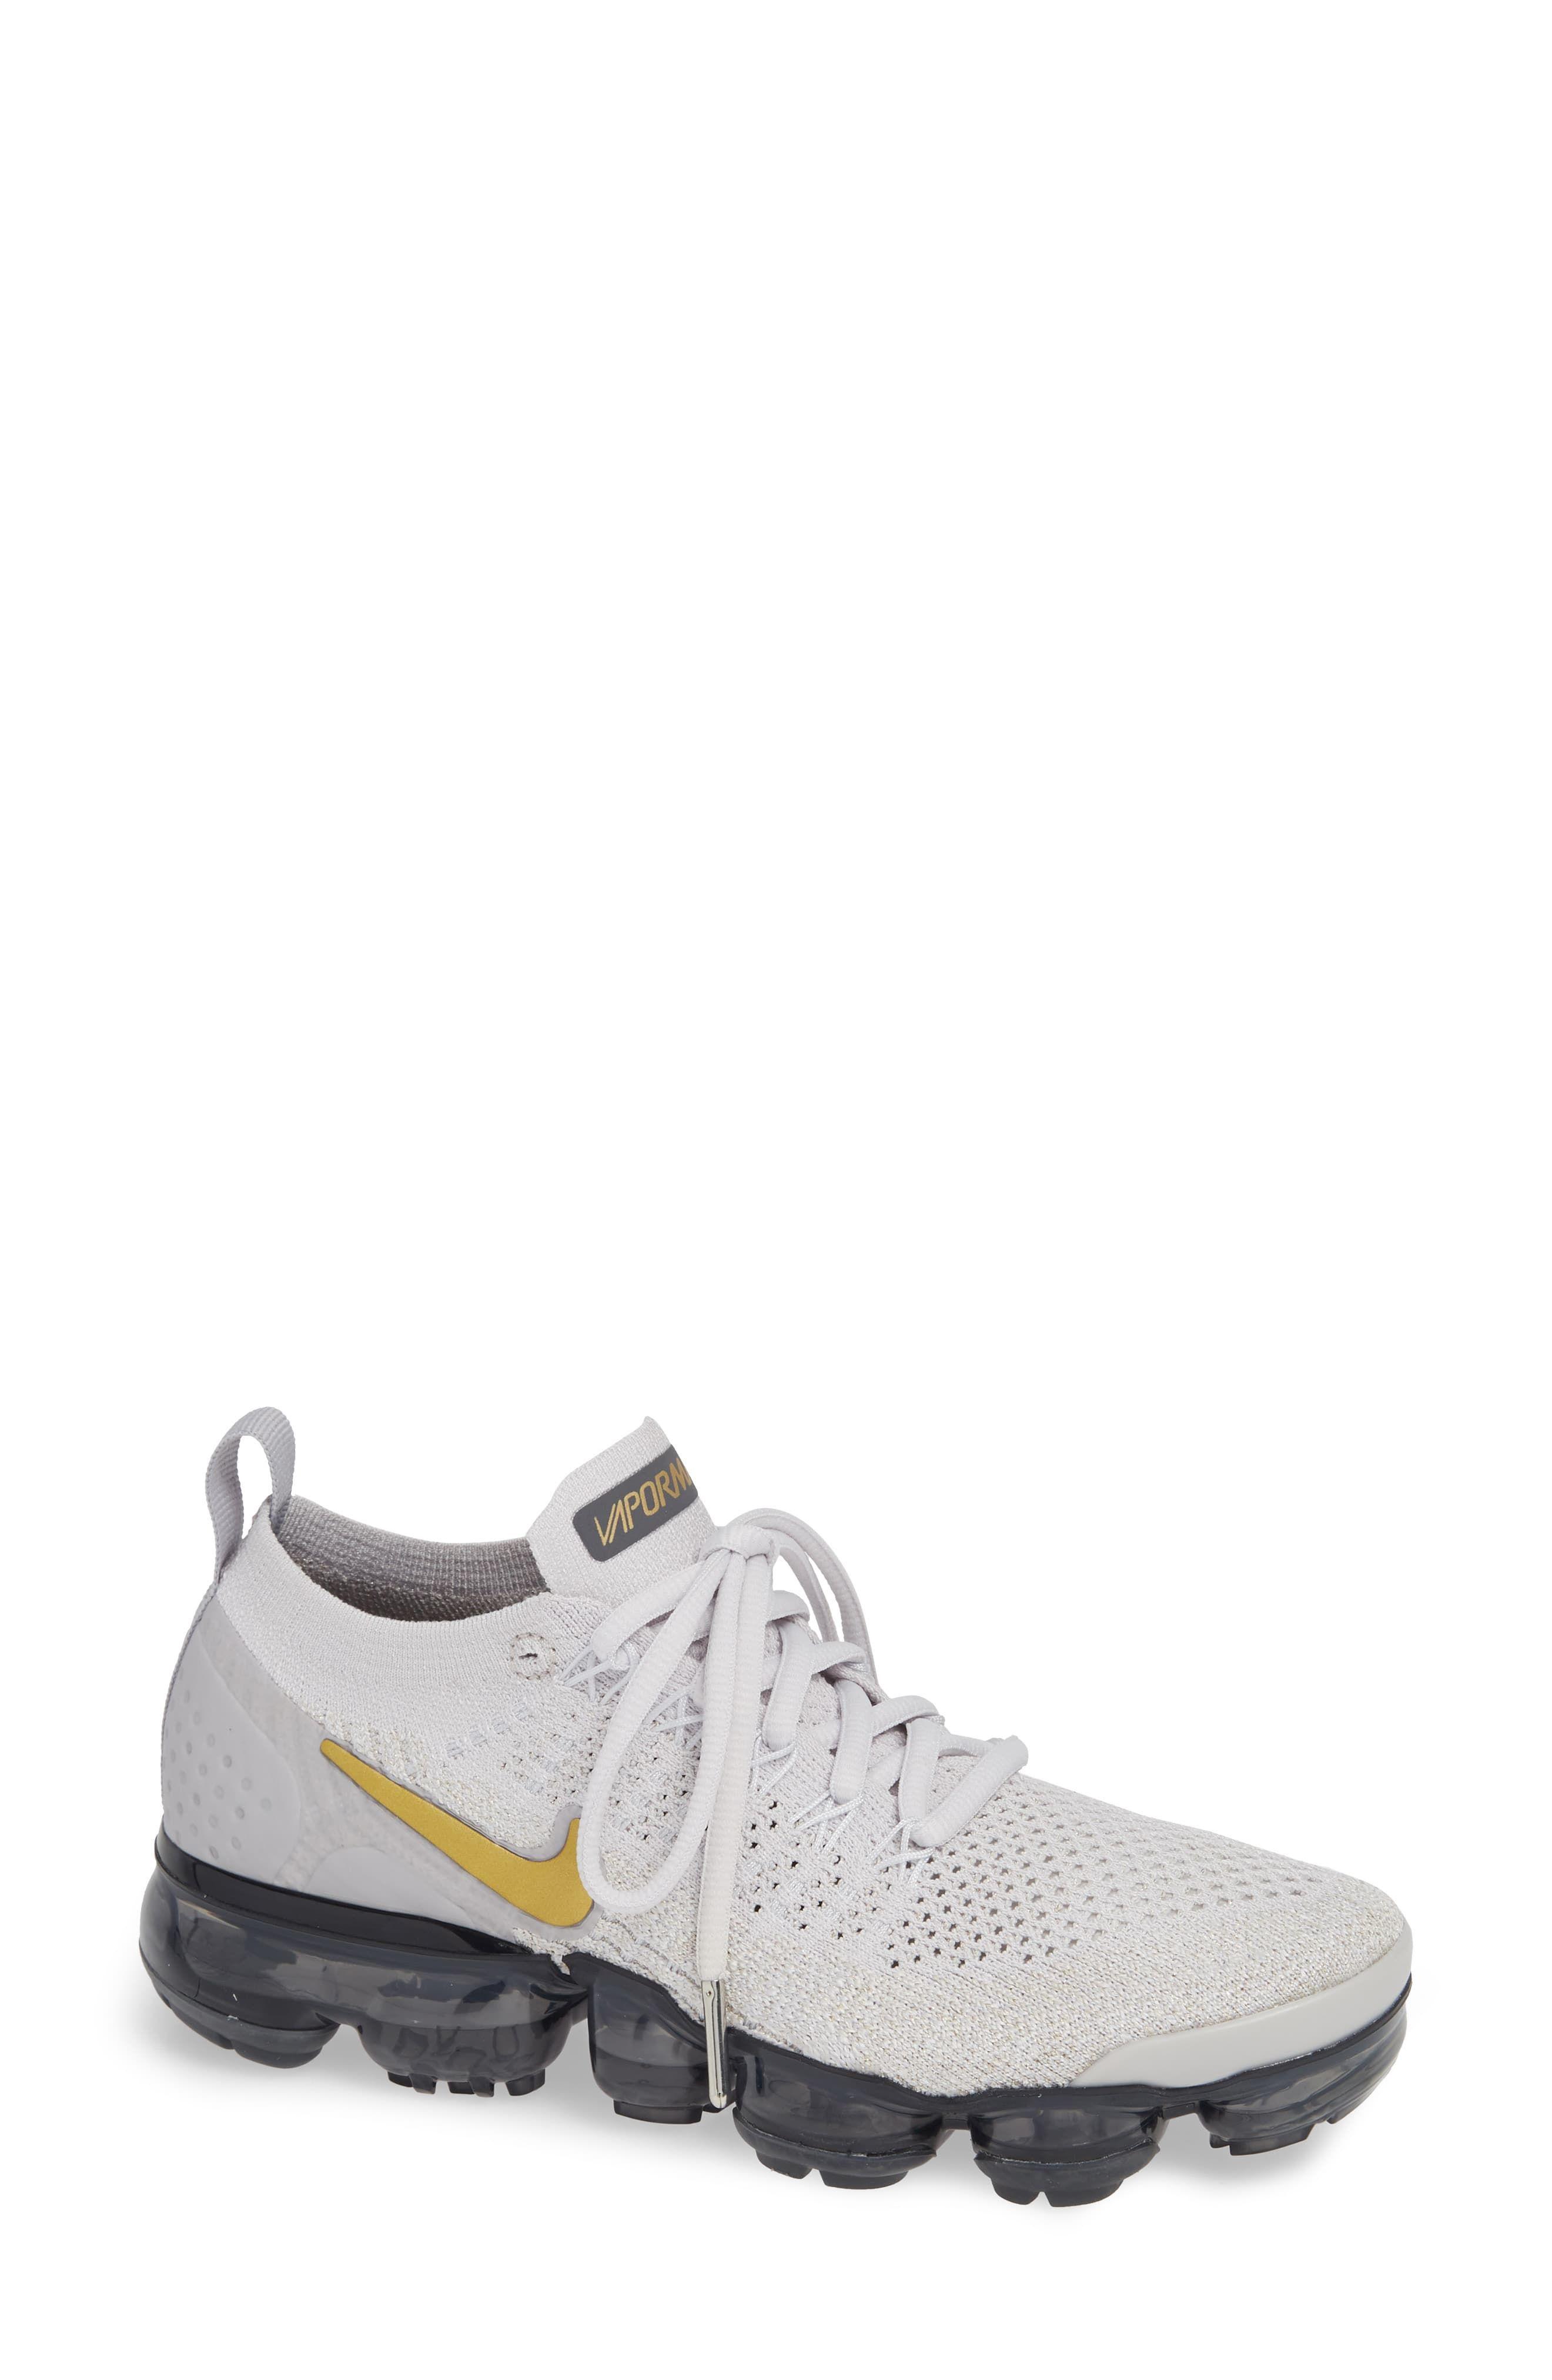 lowest price 4f7bd 69e75 Women's Nike Air Vapormax Flyknit 2 Running Shoe, Size 6 M ...